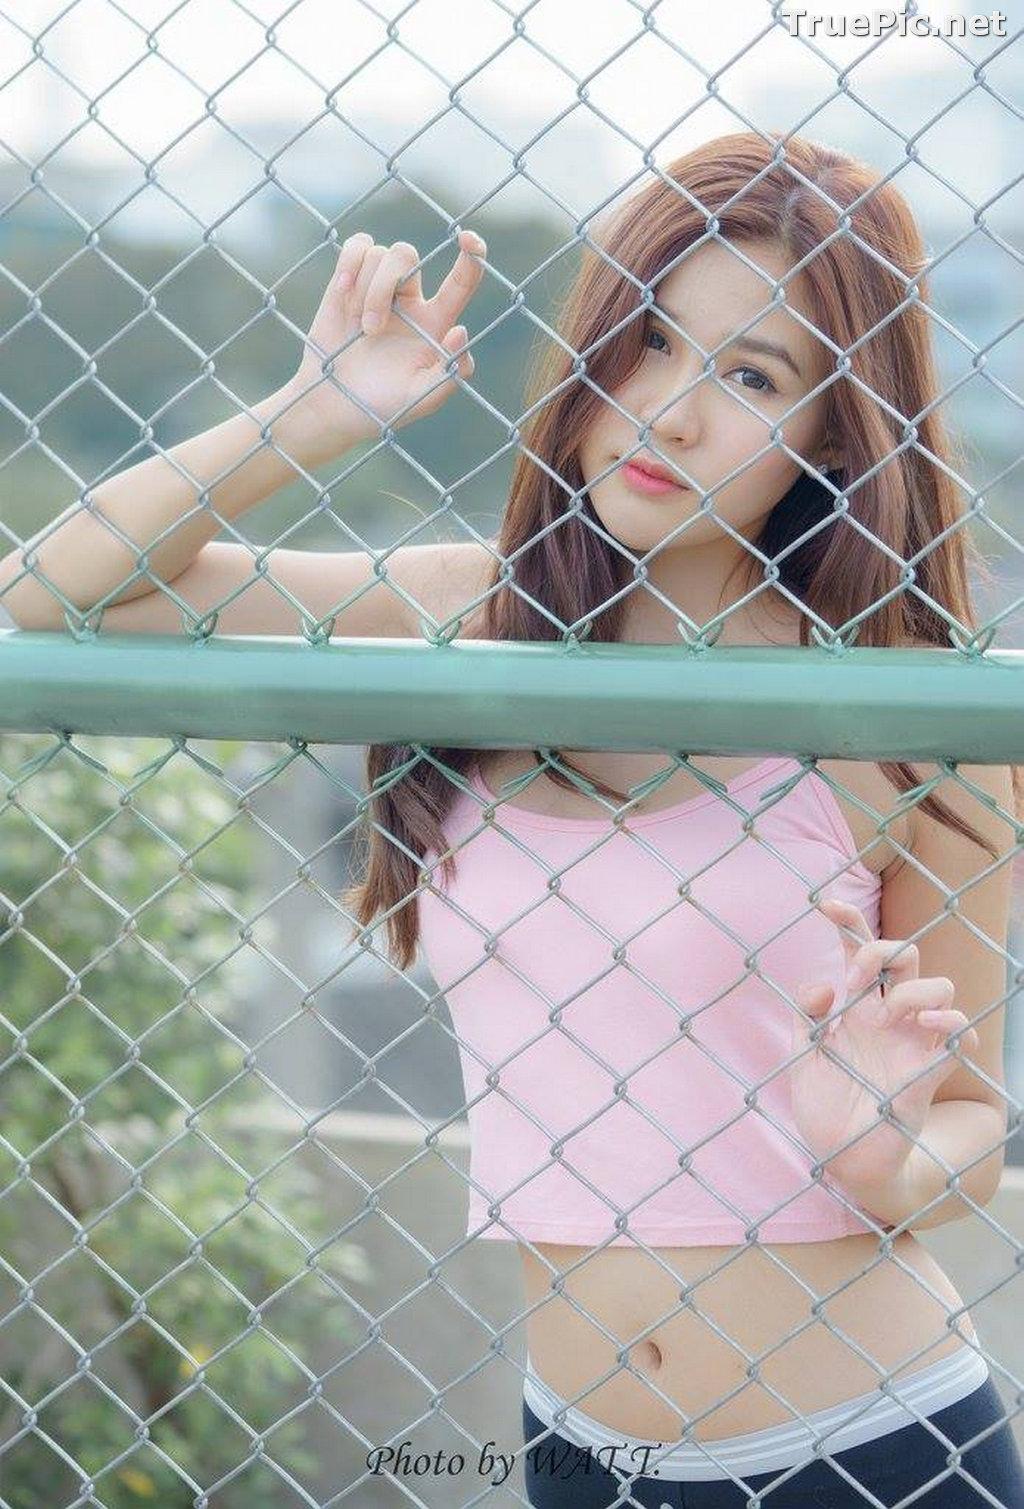 Image Thailand Cute Model - Supansa Yoopradit - Sky, Windy & Lookpla - TruePic.net - Picture-10